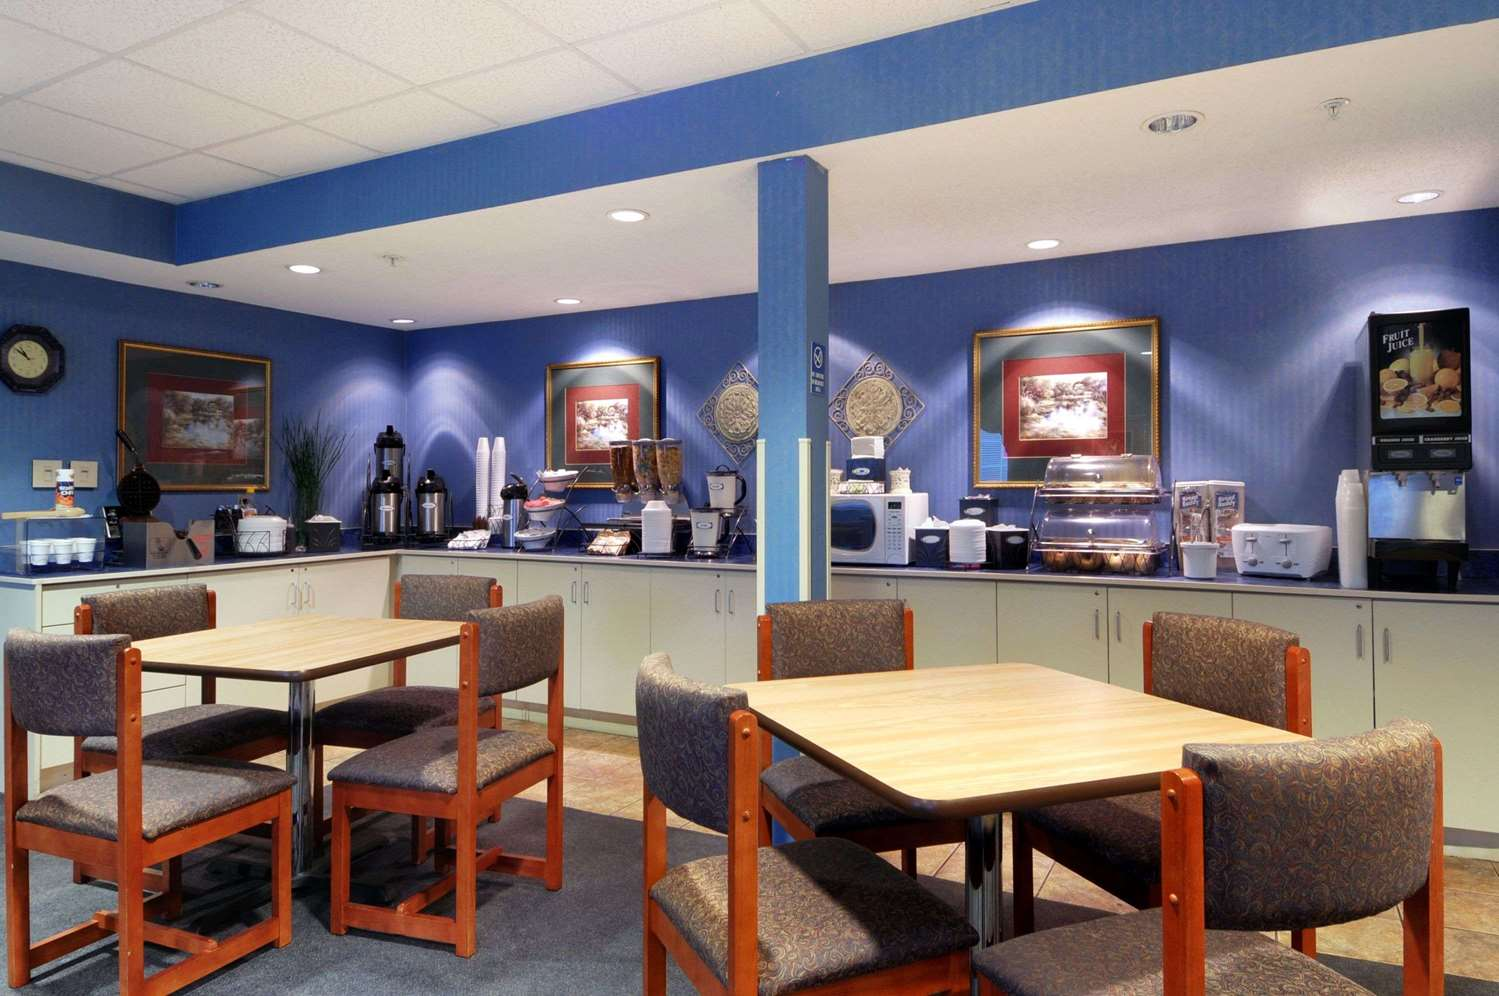 proam - Microtel Inn & Suites by Wyndham Bossier City